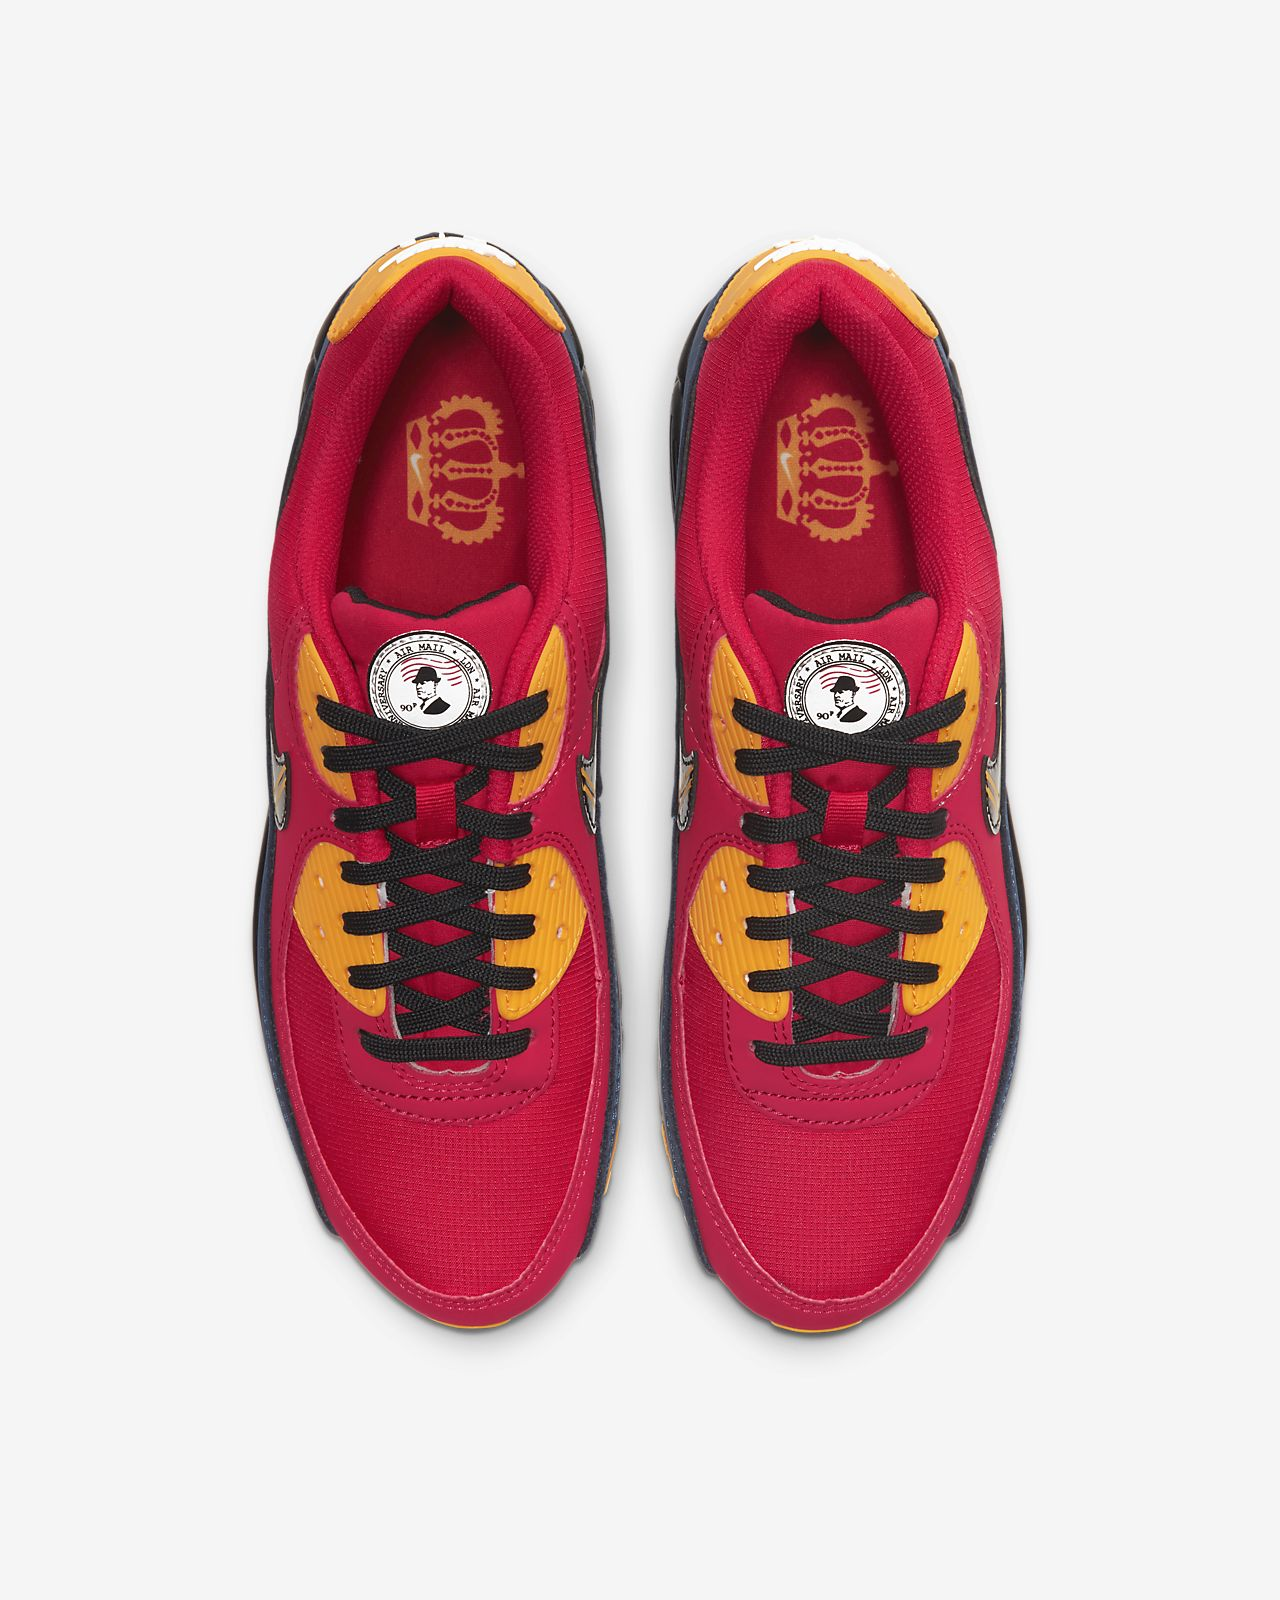 rehén refrigerador bueno  Nike Air Max 90 Premium London City Red Blue Black Mens Shoe